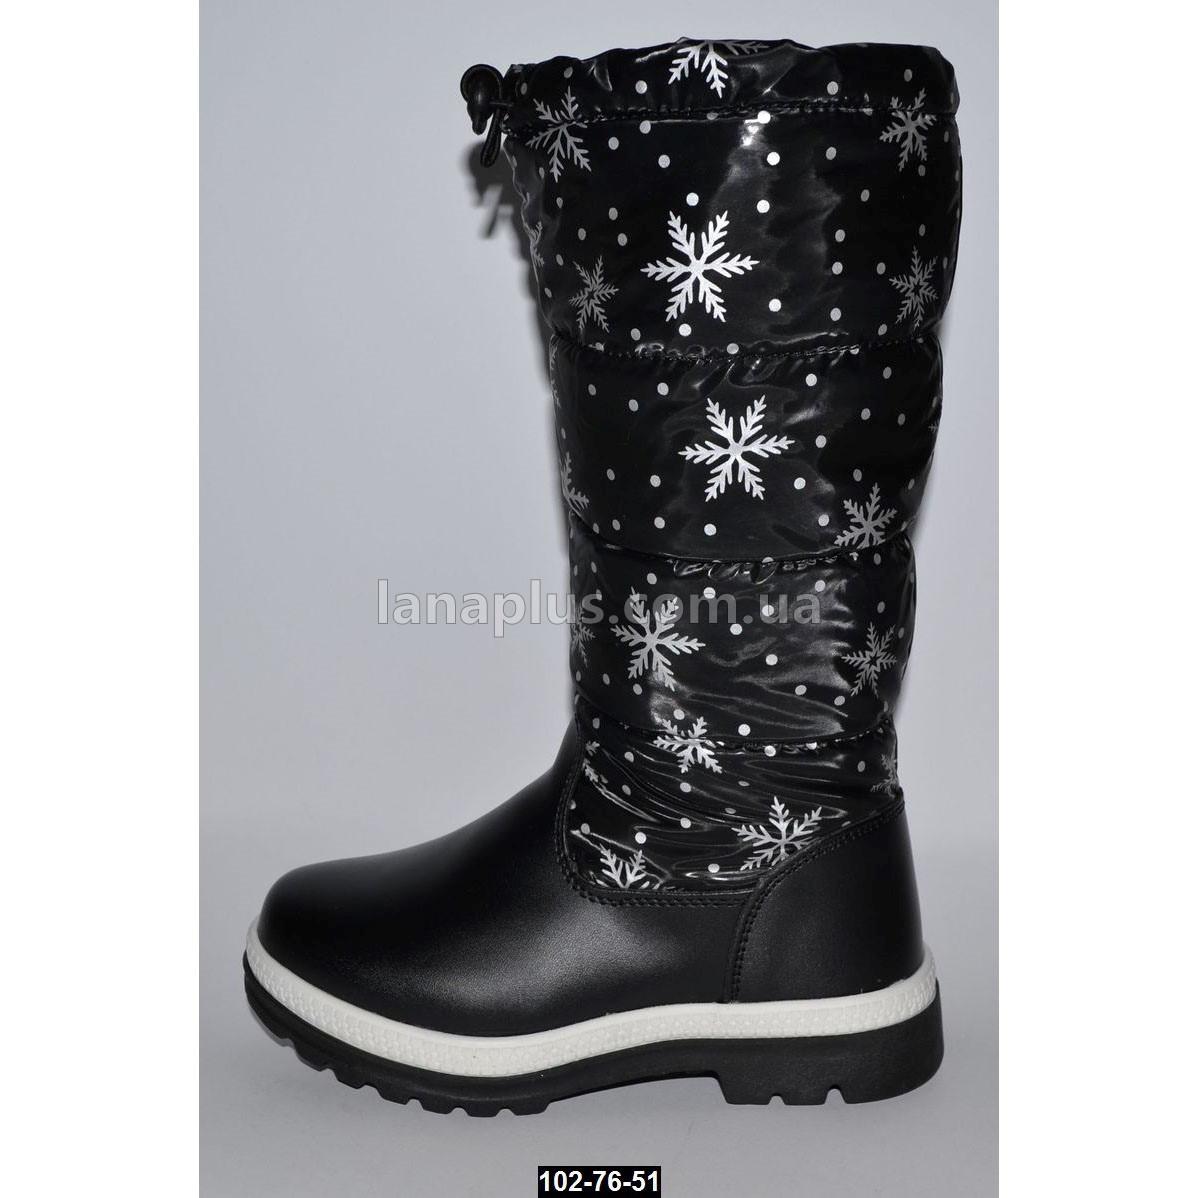 b29d983fa Теплые непромокающие зимние сапоги для девочки, 32-37 размер, дутики на меху